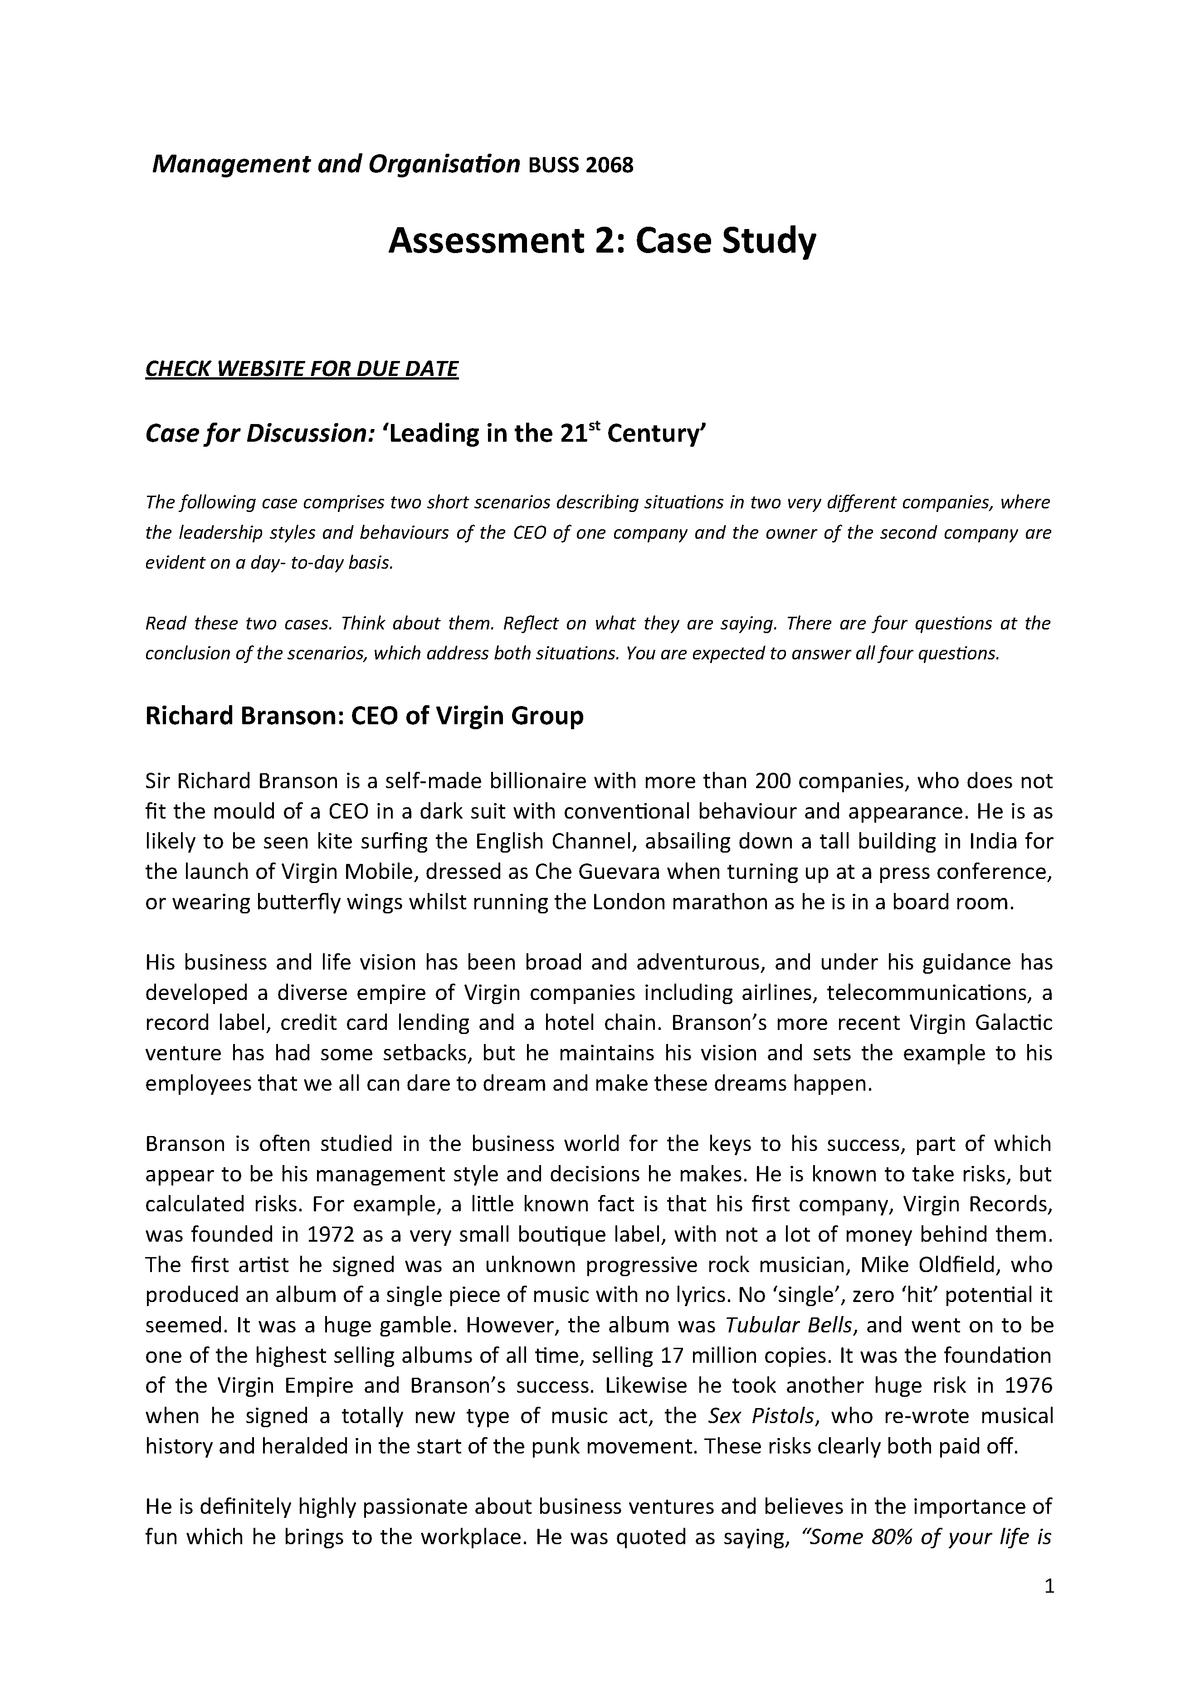 Case Study Discussion